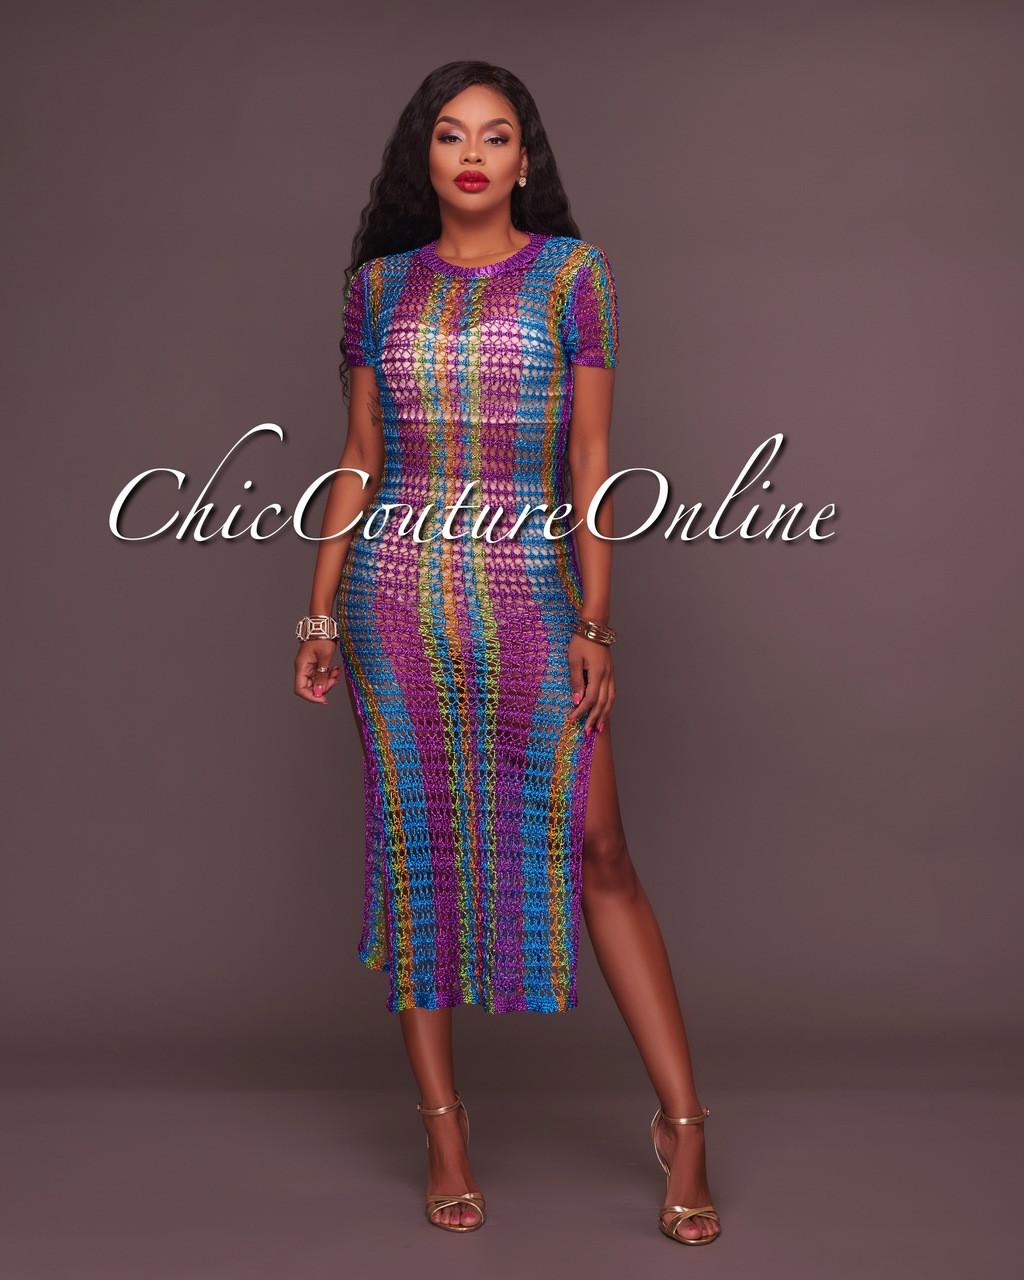 Calleandra Multi Color Metallic Crochet Cover Up Dress